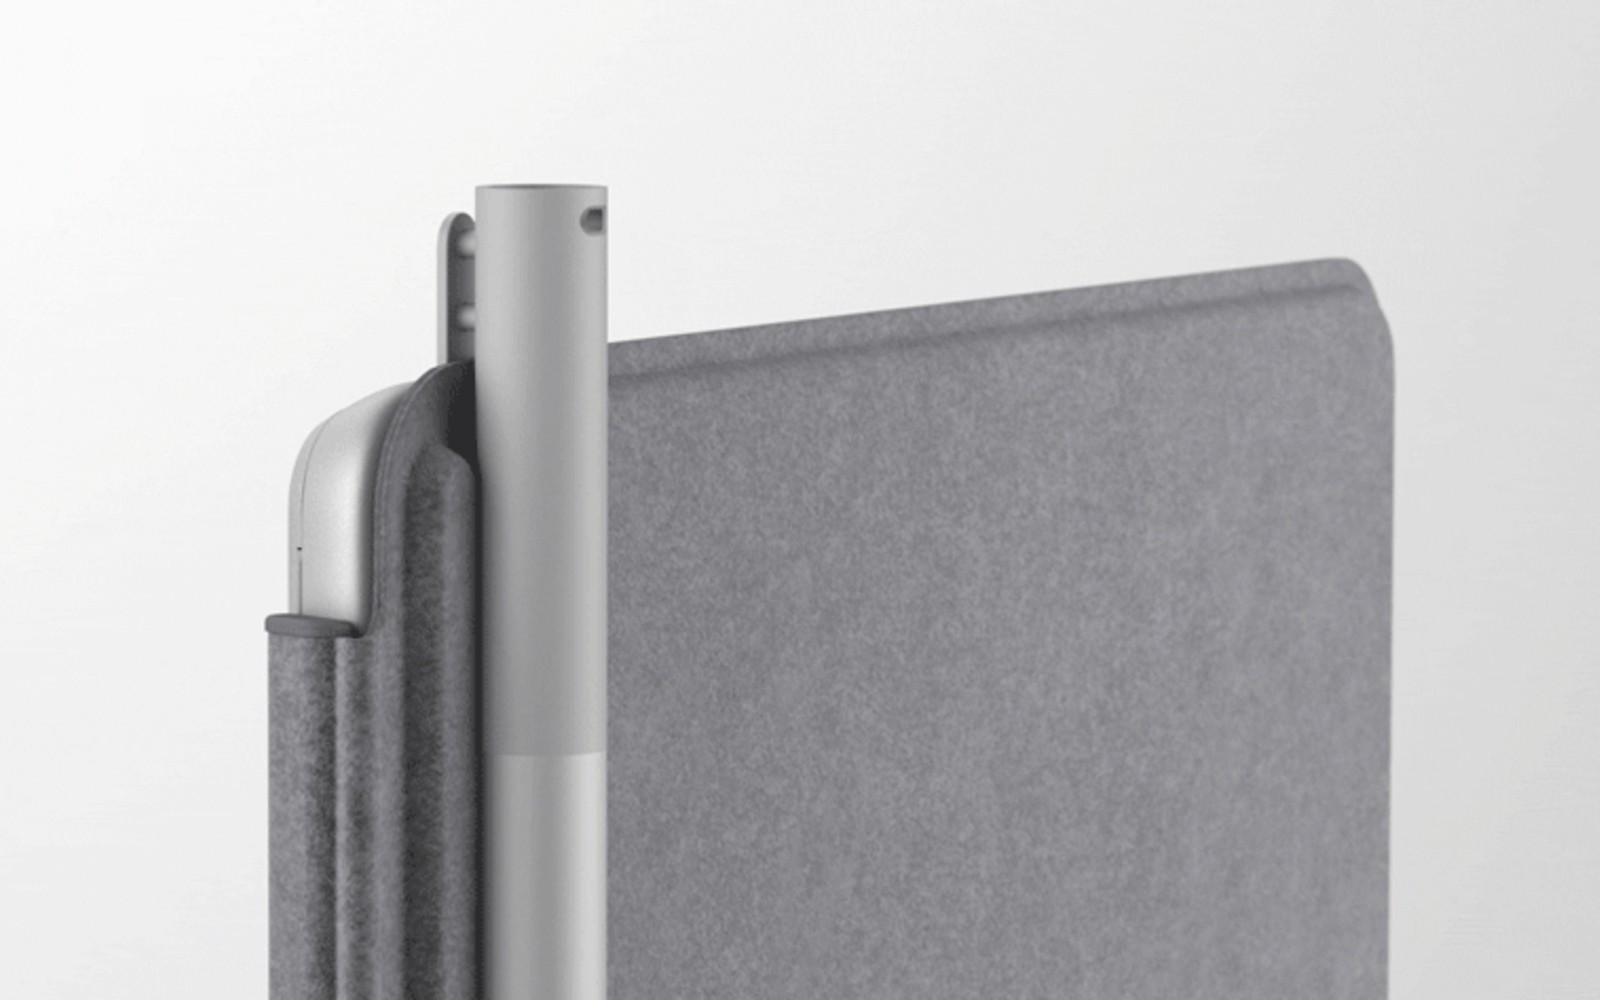 Microsoft's Classroom Pen 2 is half the price of its predecessor - Engadget